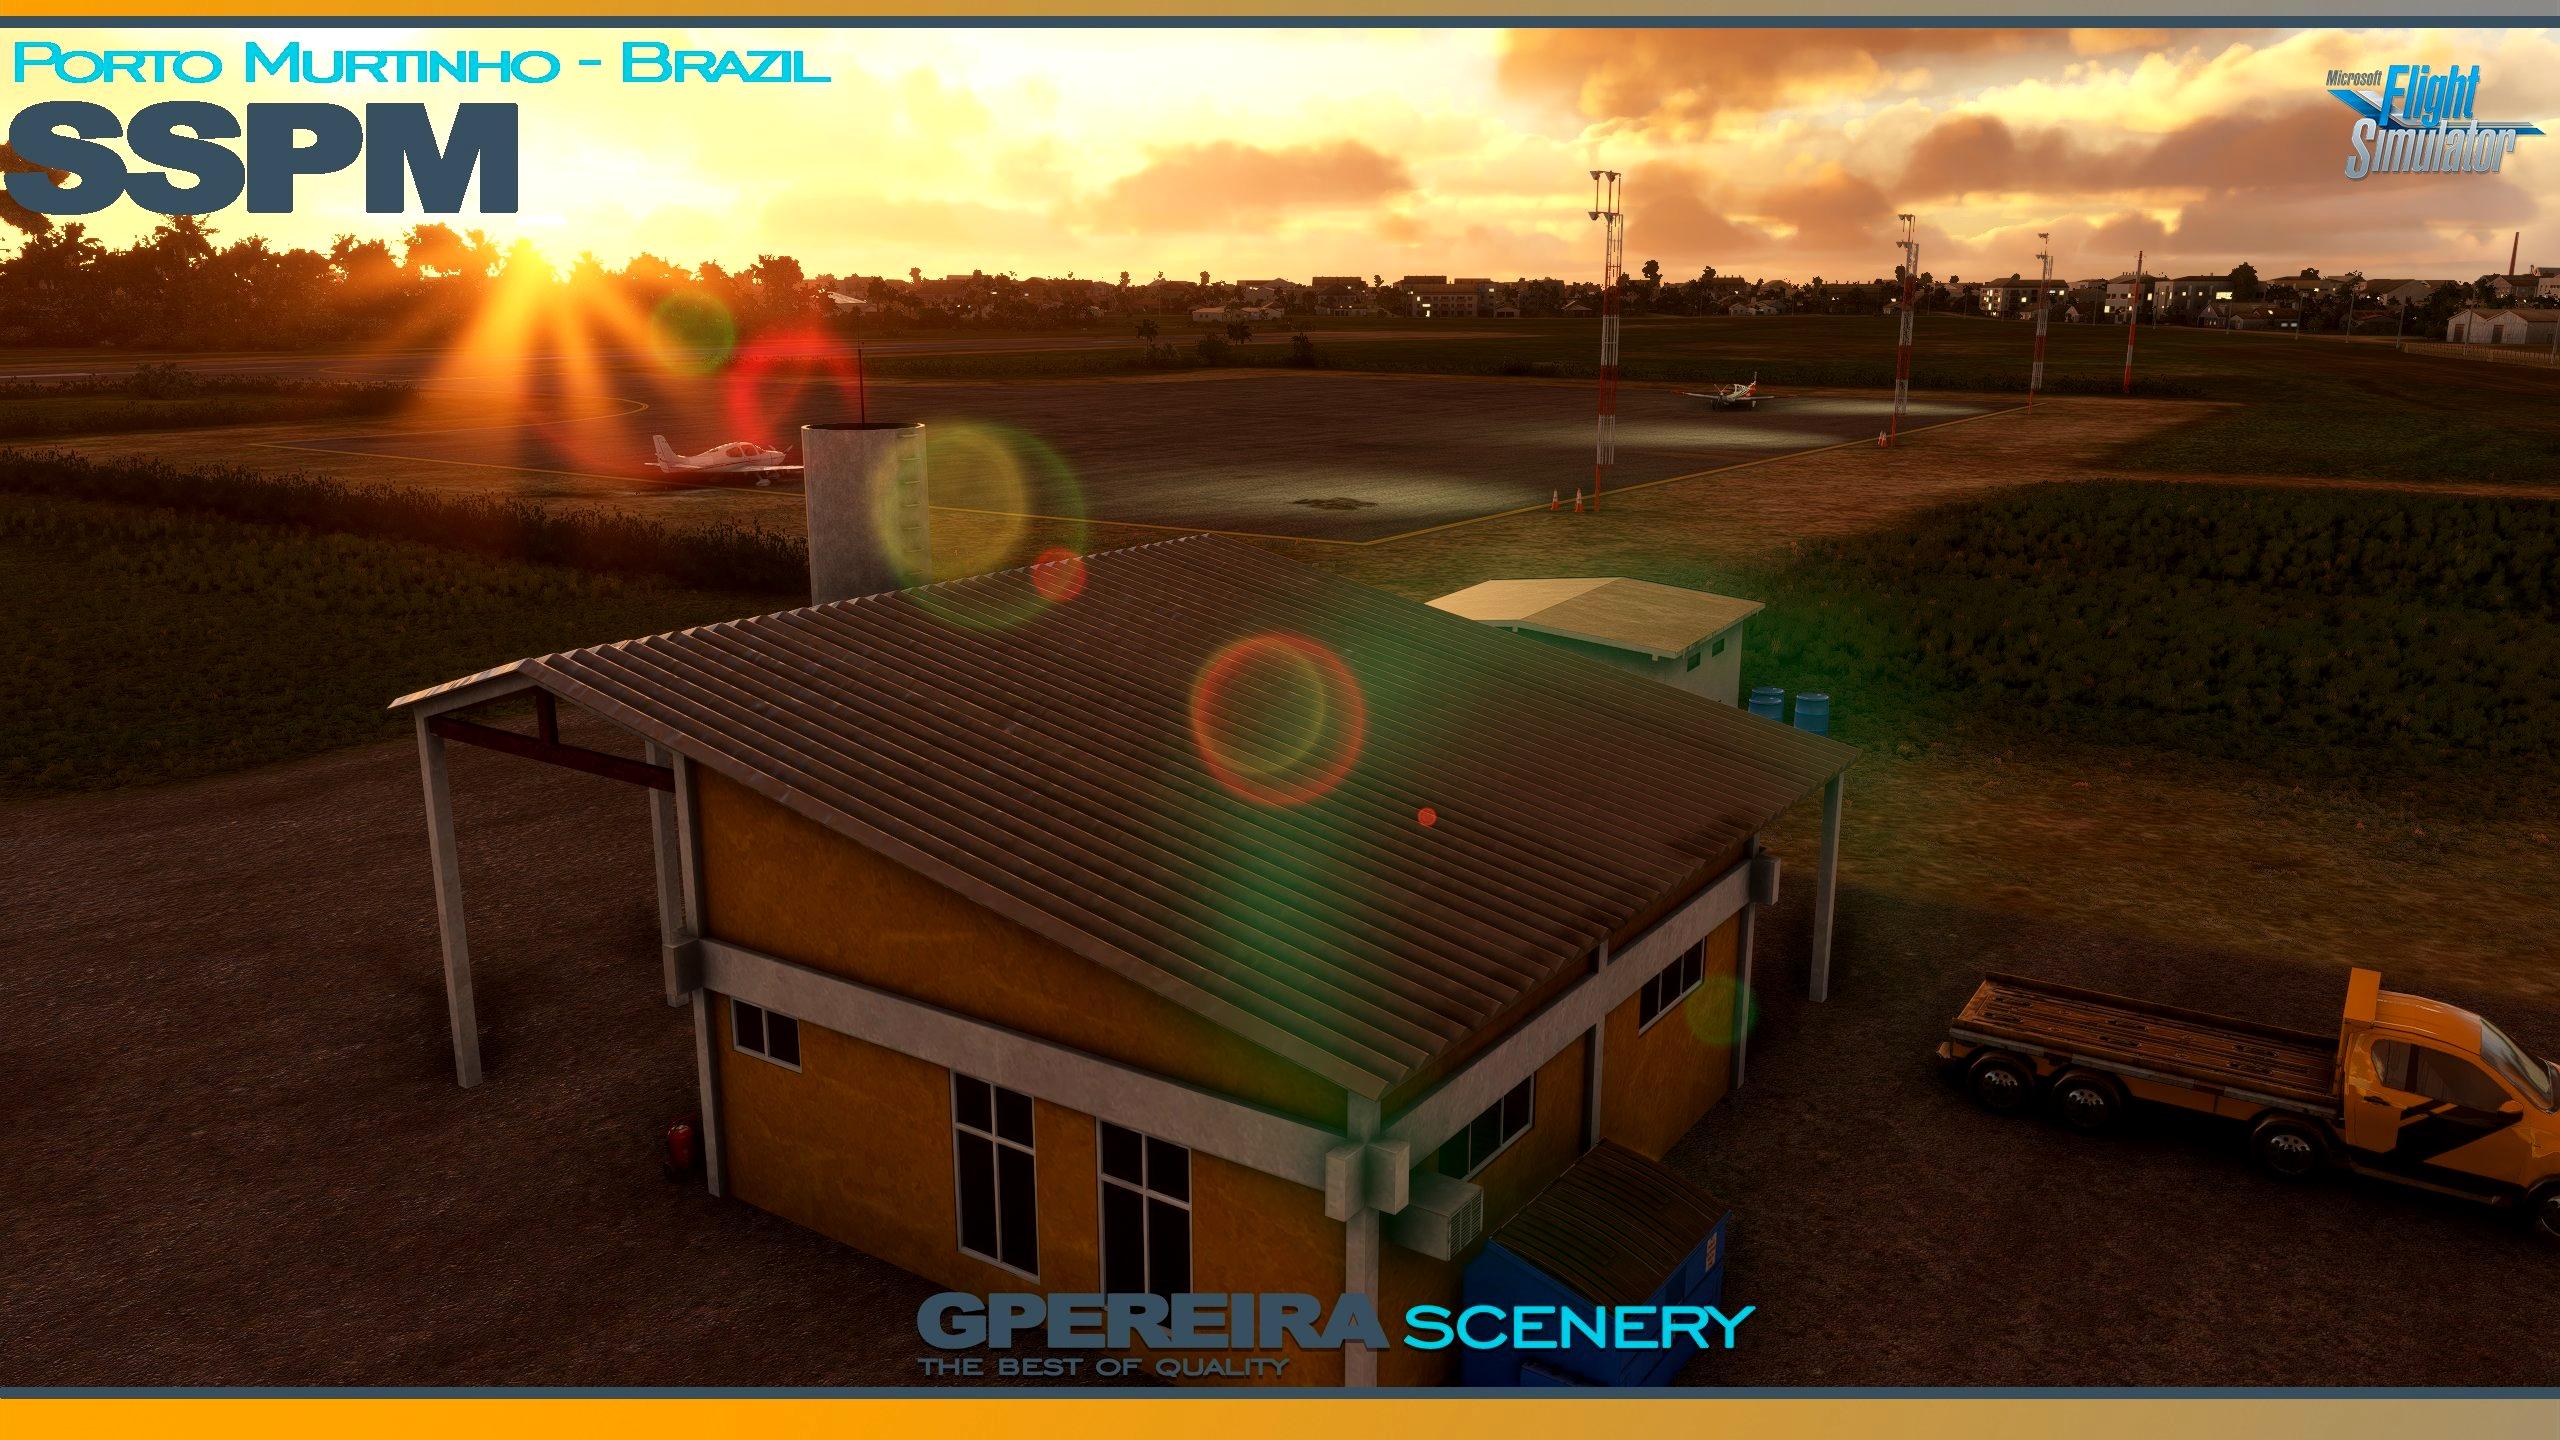 GPEREIRA SCENERY - PORTO MURTINHO - SSPM - BRAZIL - MSFS Microsoft Flight Simulator